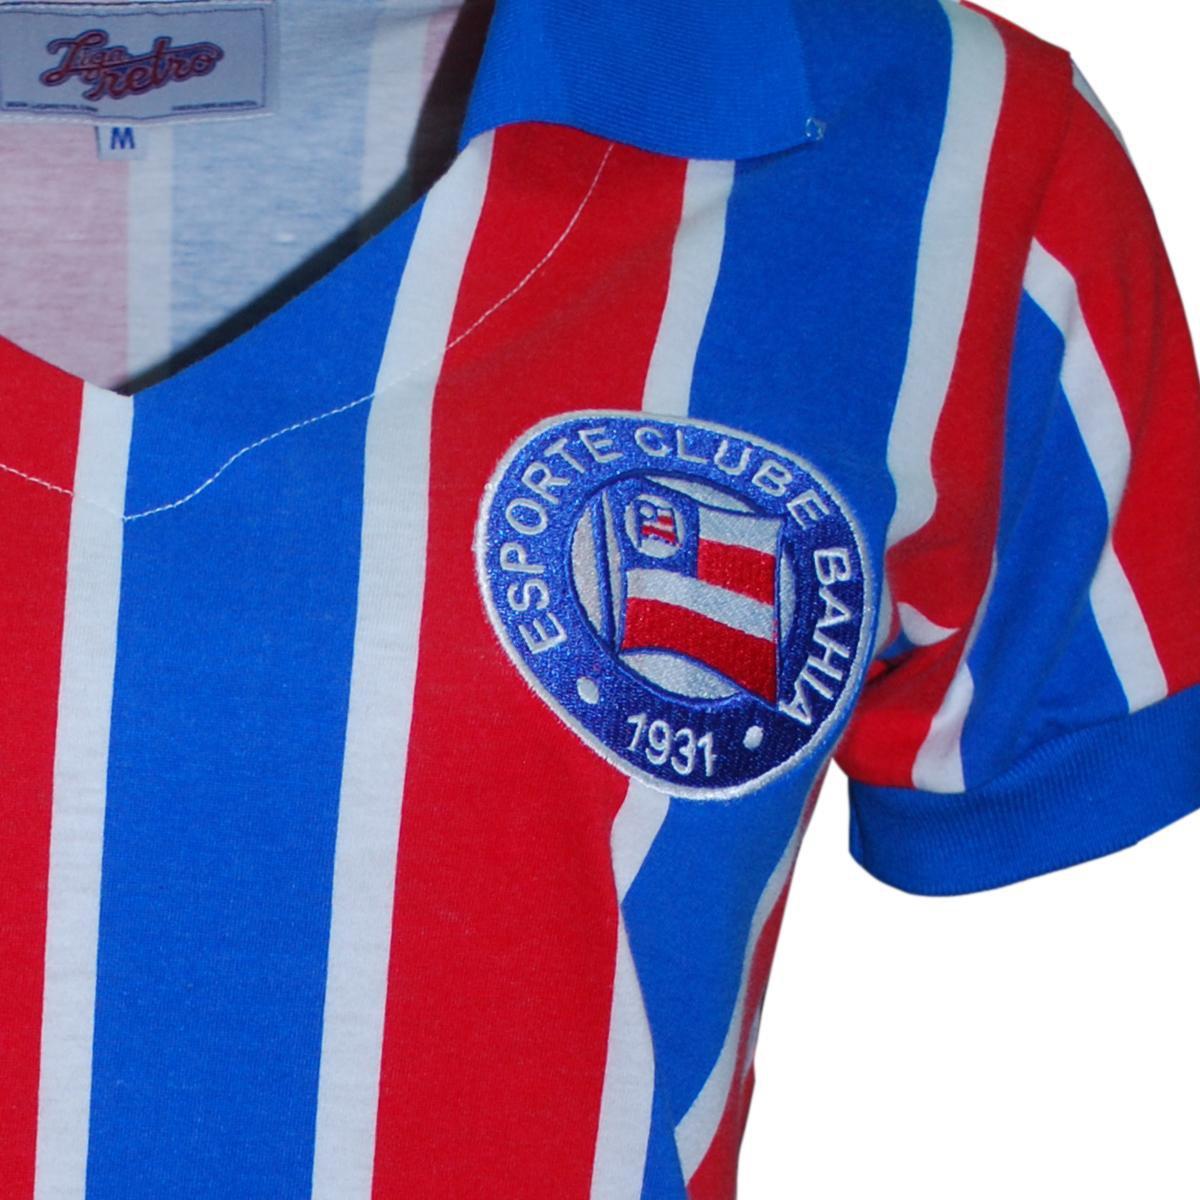 e Camisa Azul Liga Bahia Feminina Camisa Liga Retrô Vermelho rT7Oq0rwx